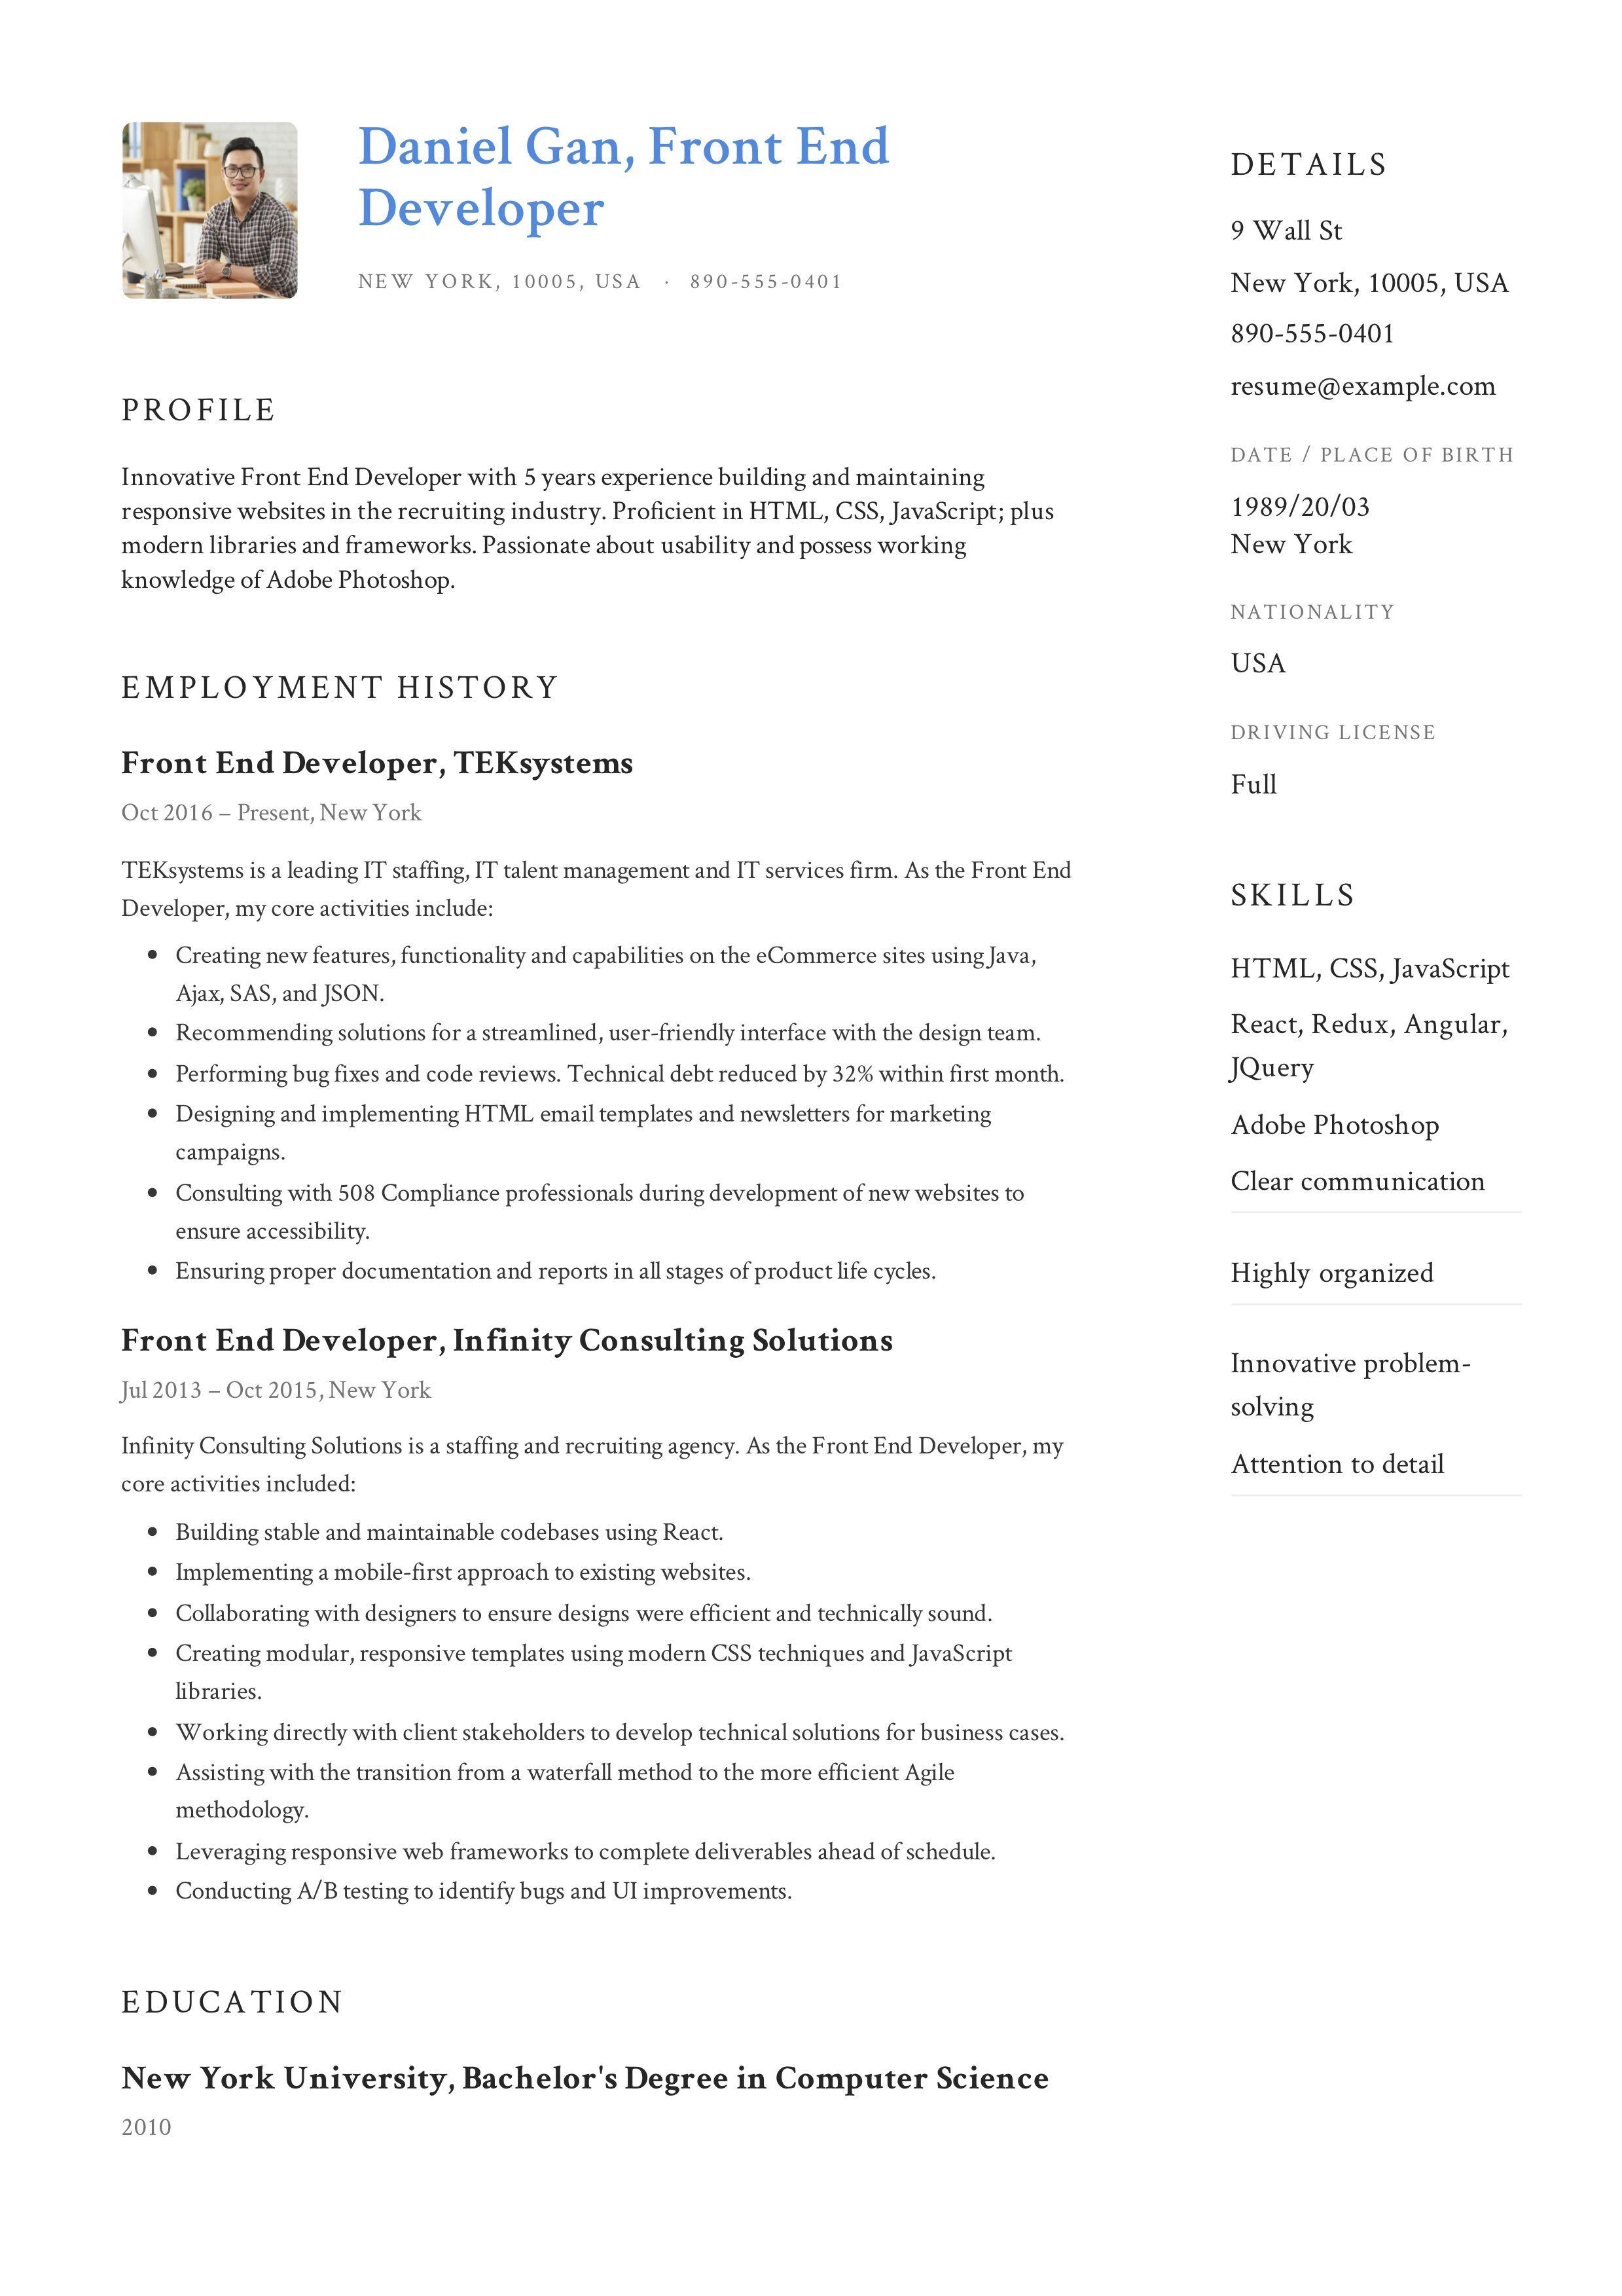 Front End Developer Resume Example Resume Examples Resume Objective Examples Resume